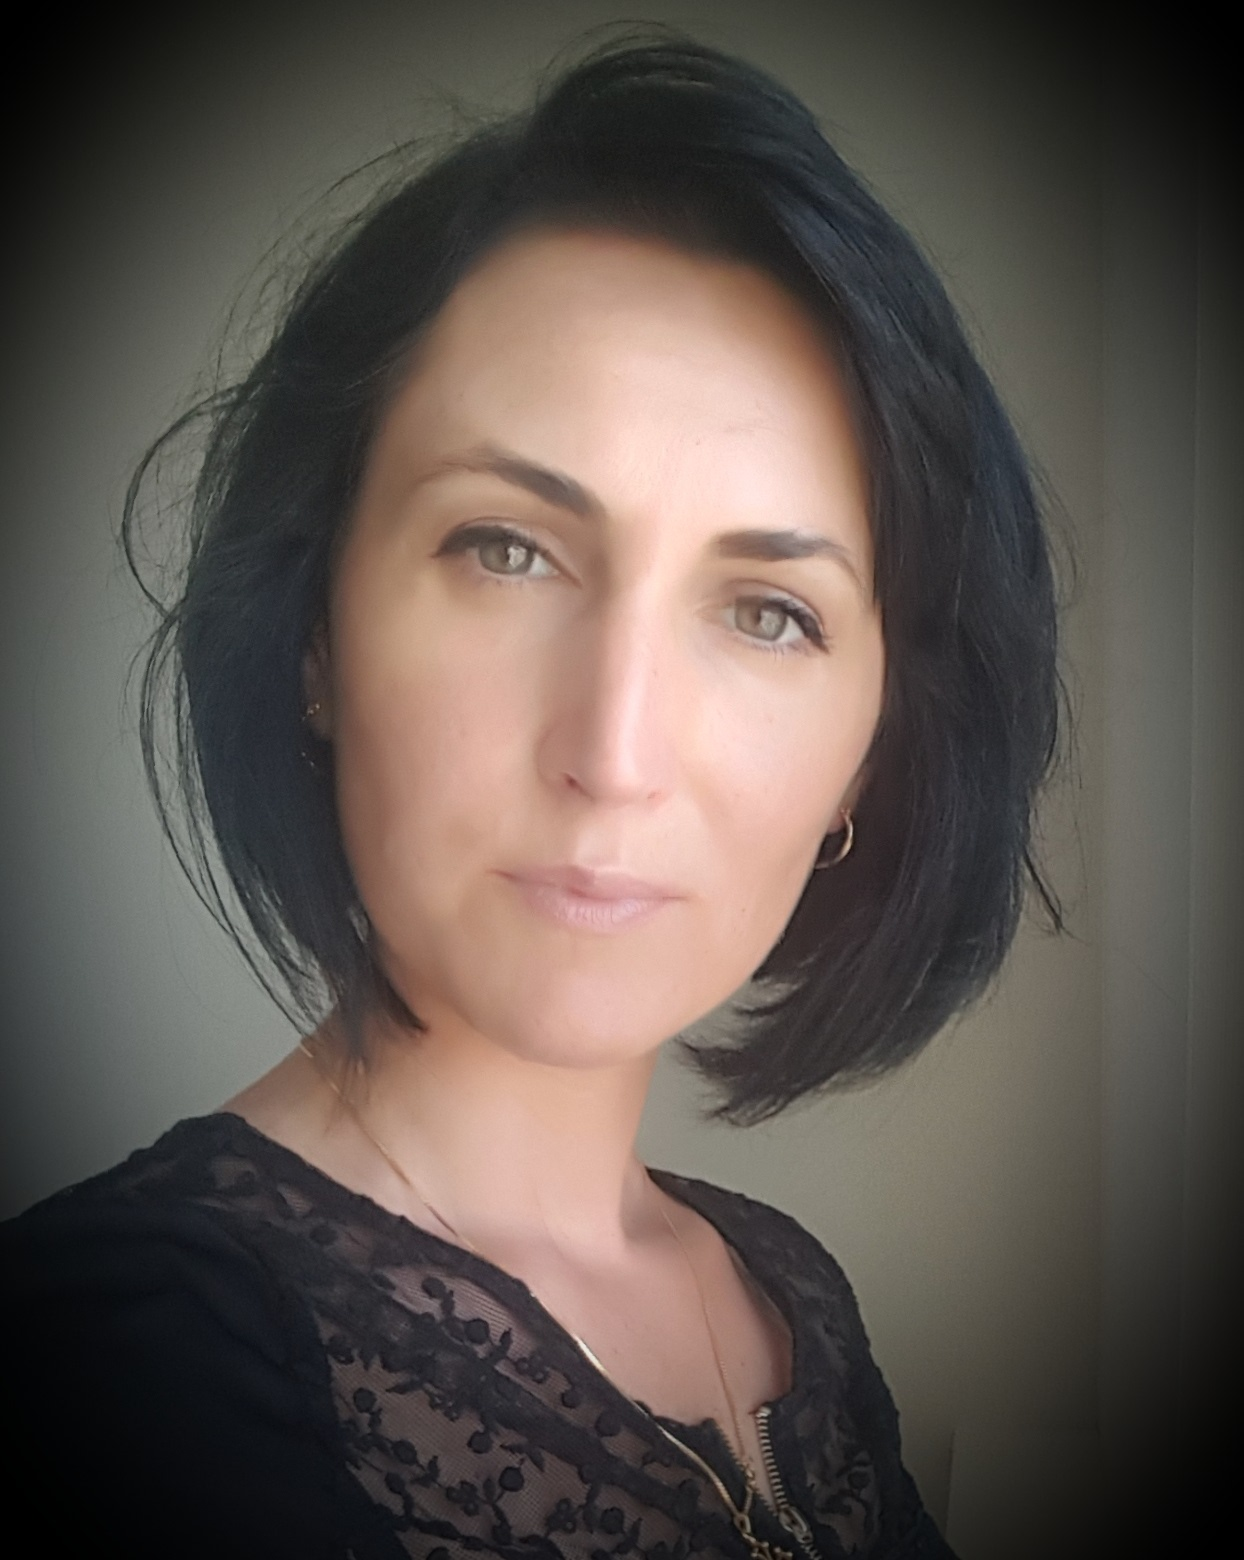 Mariola Marzouk